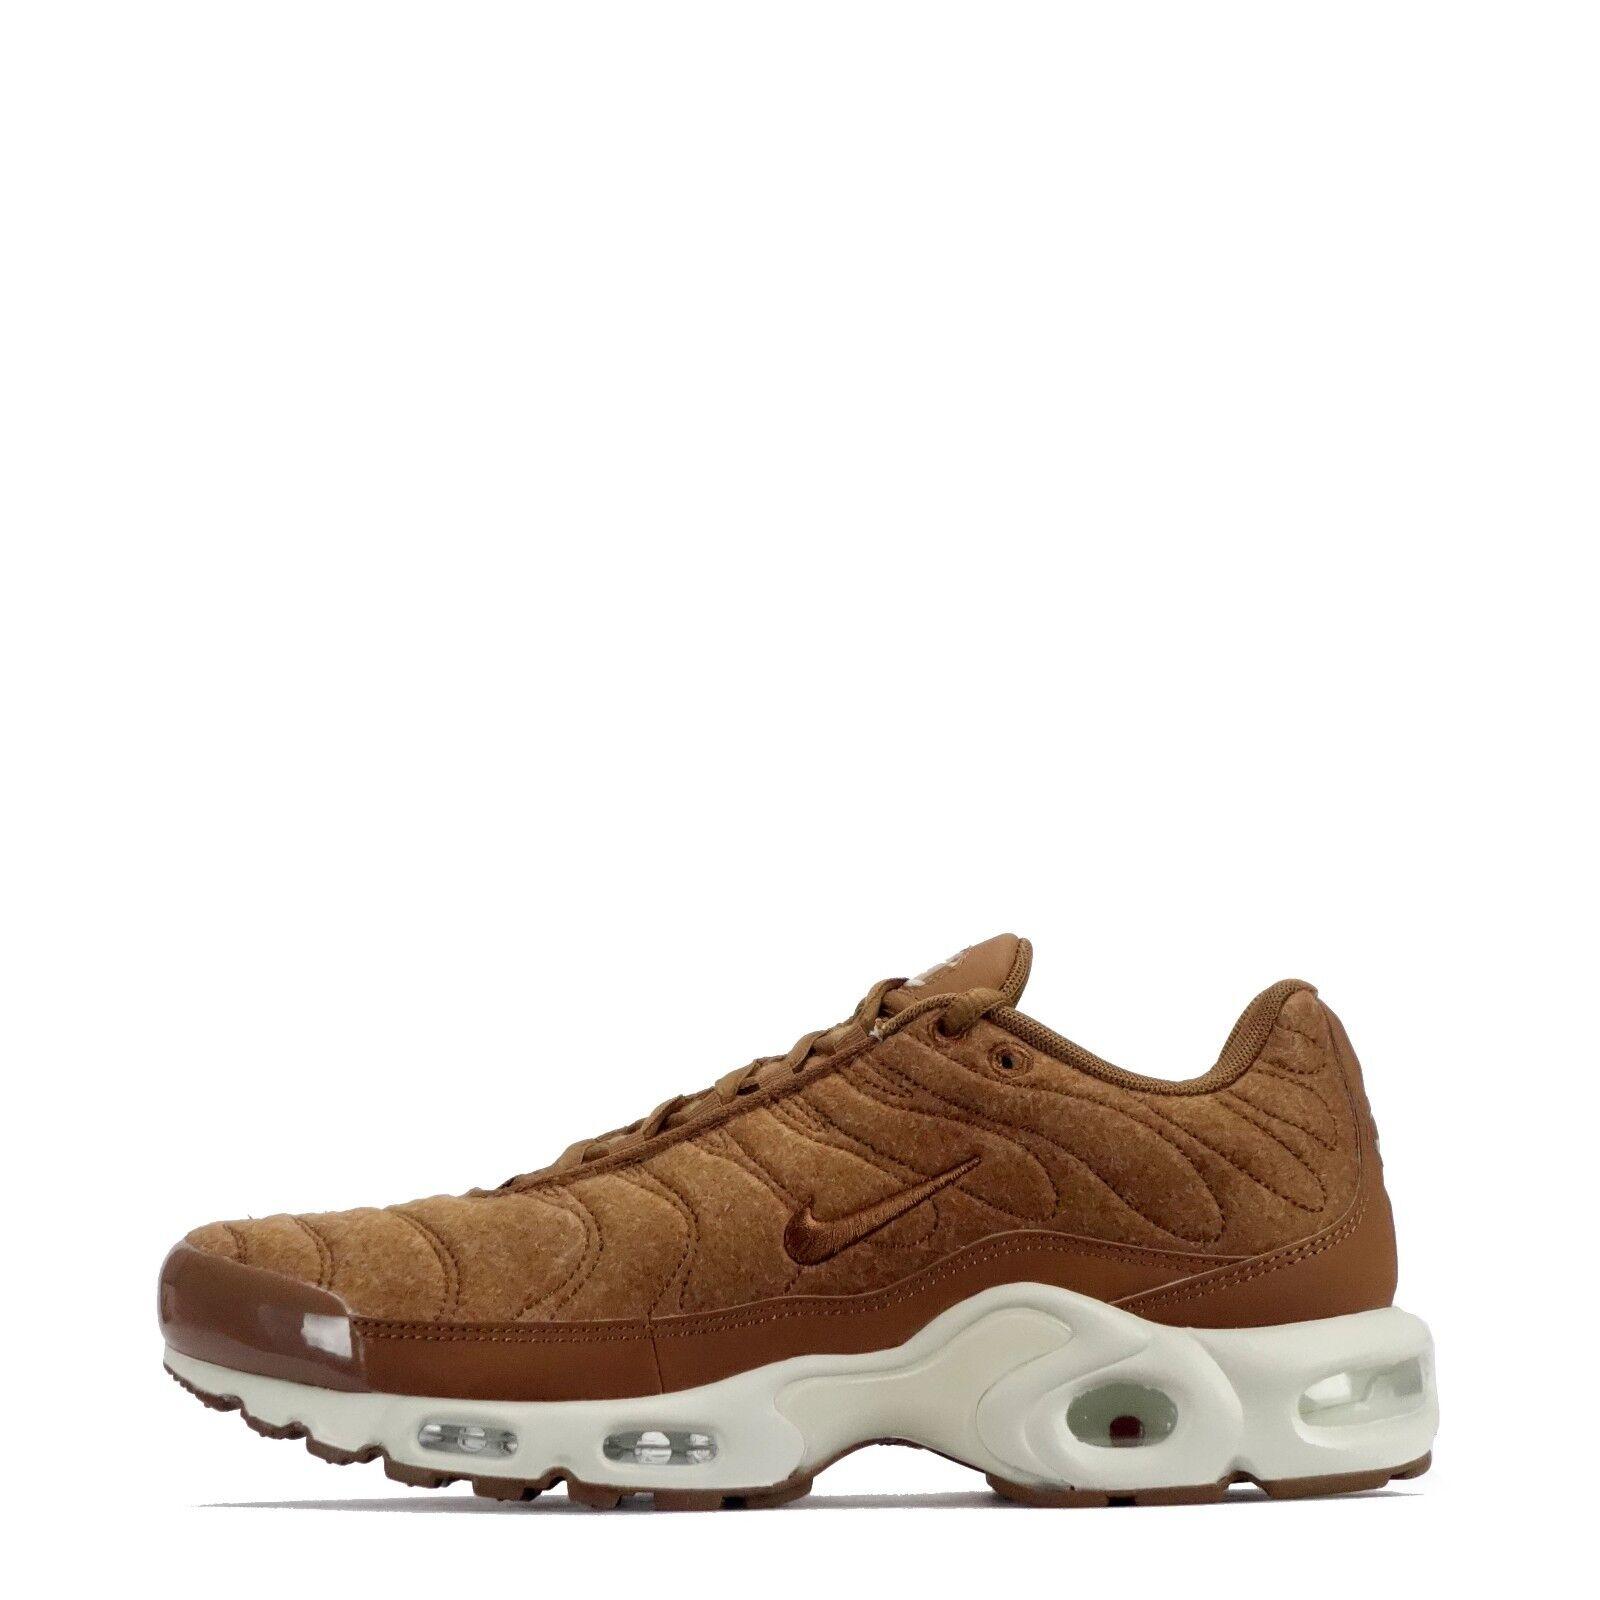 Nike Air Max Plus Casual Quilted TN tuned Hombre Casual Plus estilo formadores zapatos Ale Marrón da9b8b